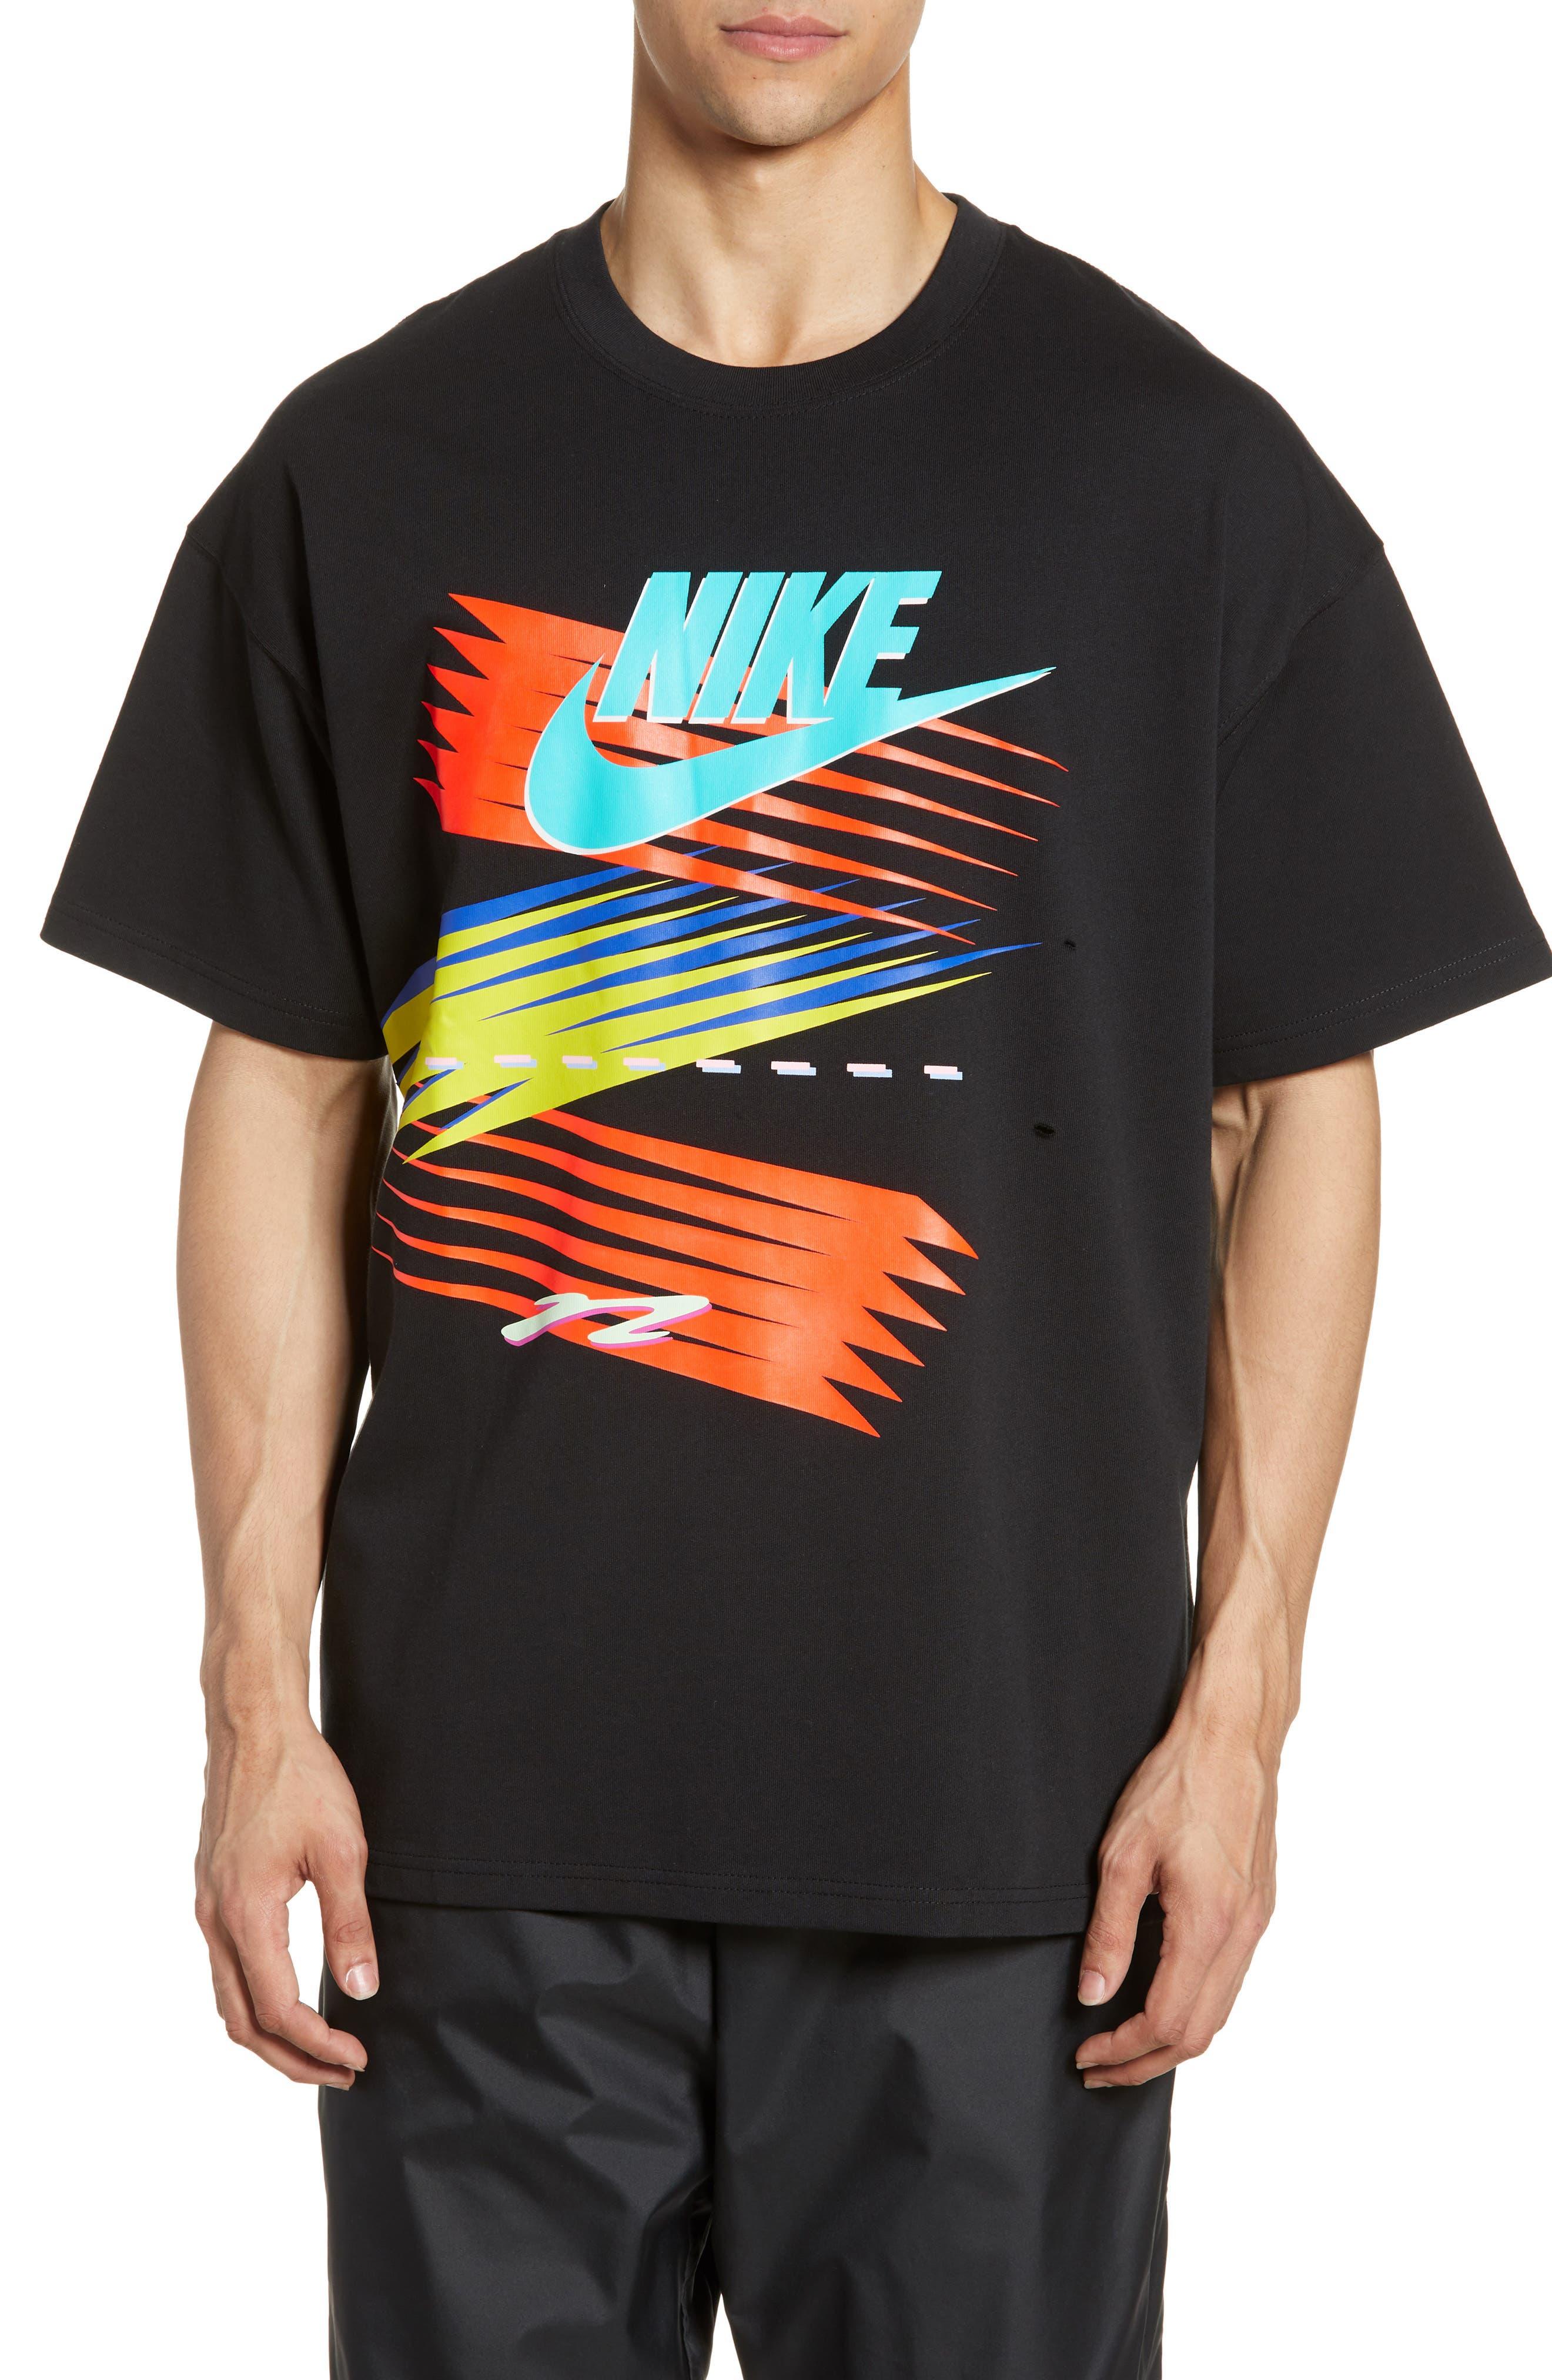 X Atmos Men's T Shirt by Nike